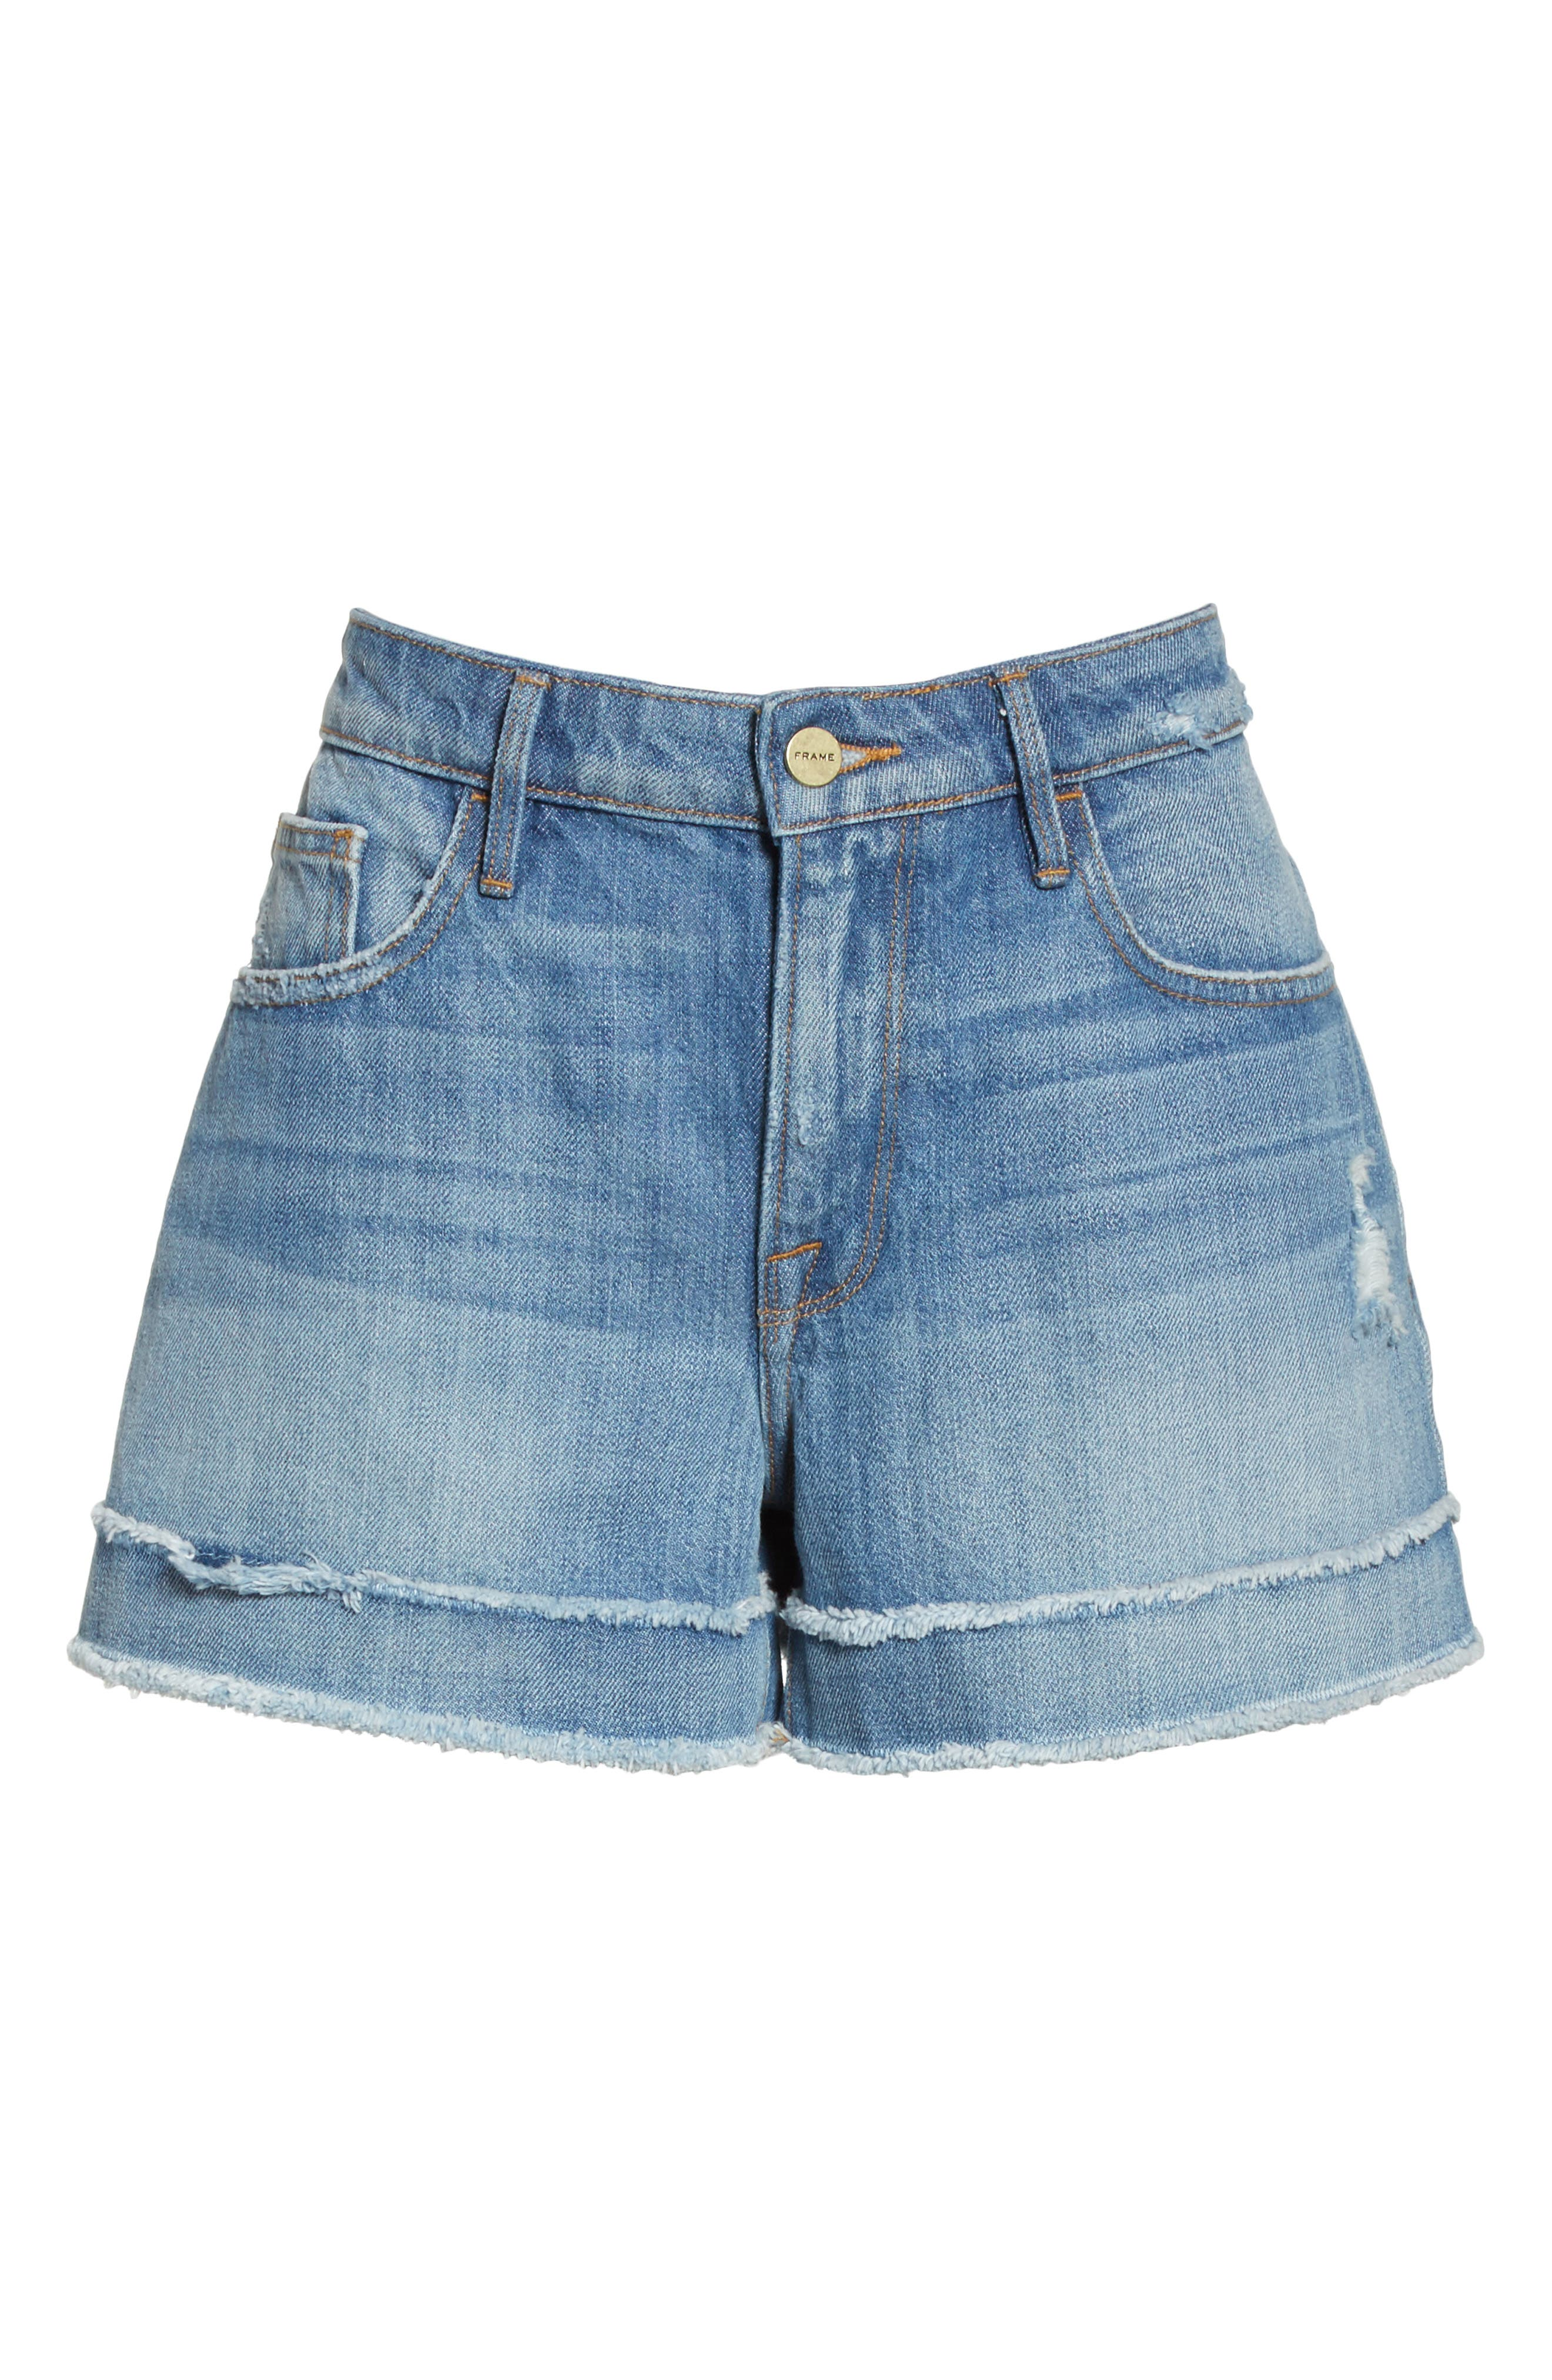 Le Grand Garçon Fray Cuff Denim Shorts,                             Alternate thumbnail 6, color,                             Heston